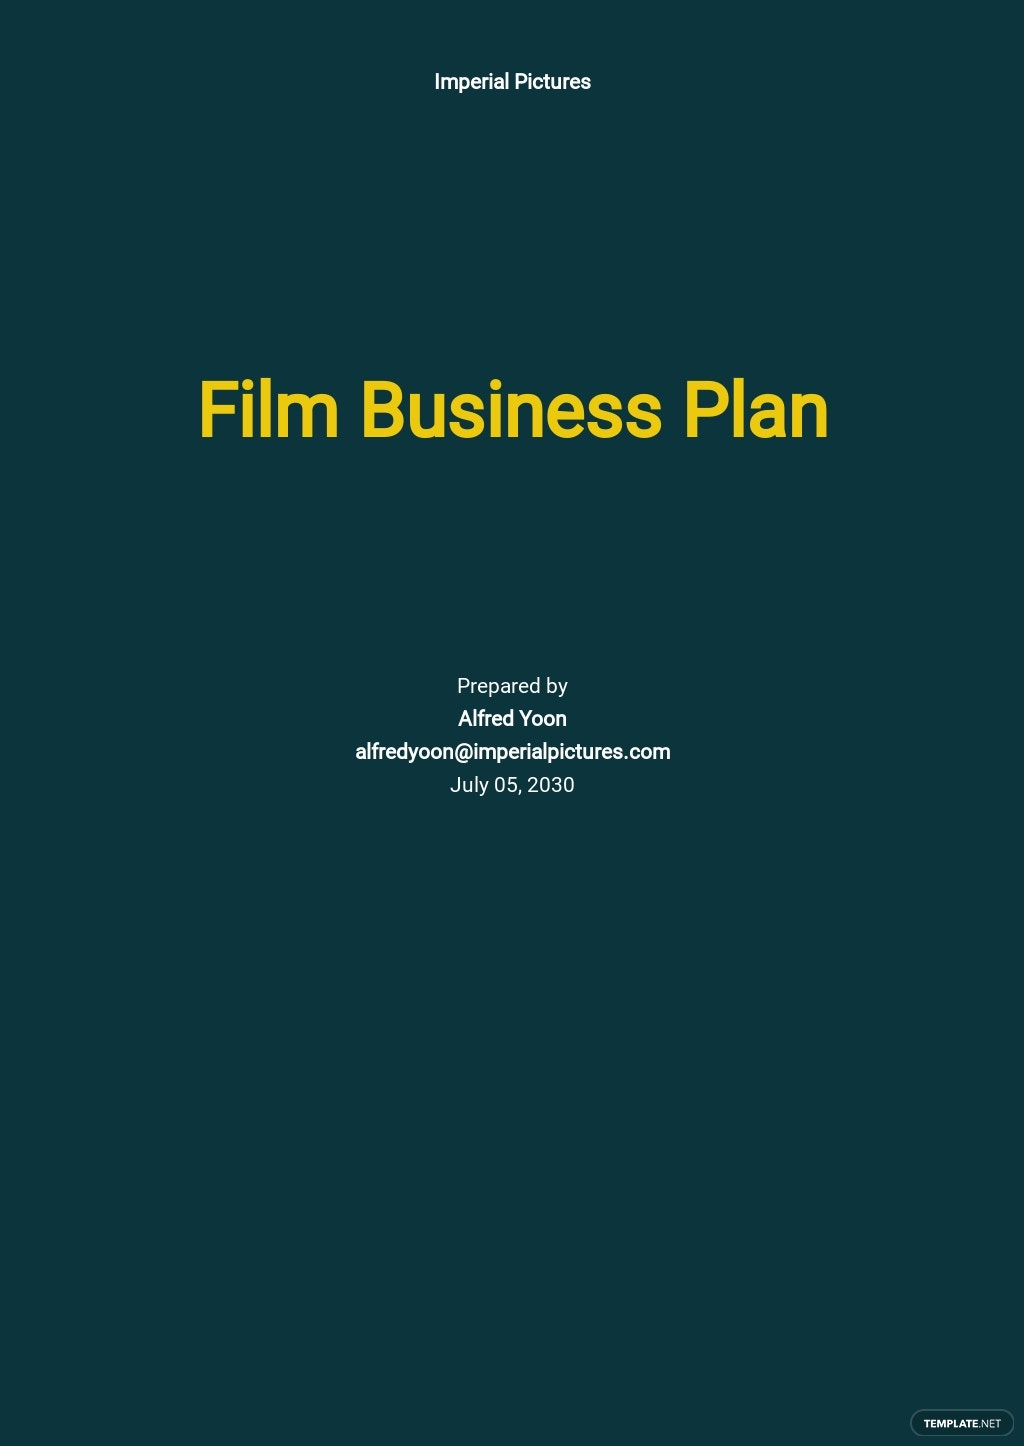 Film Business Plan Template.jpe